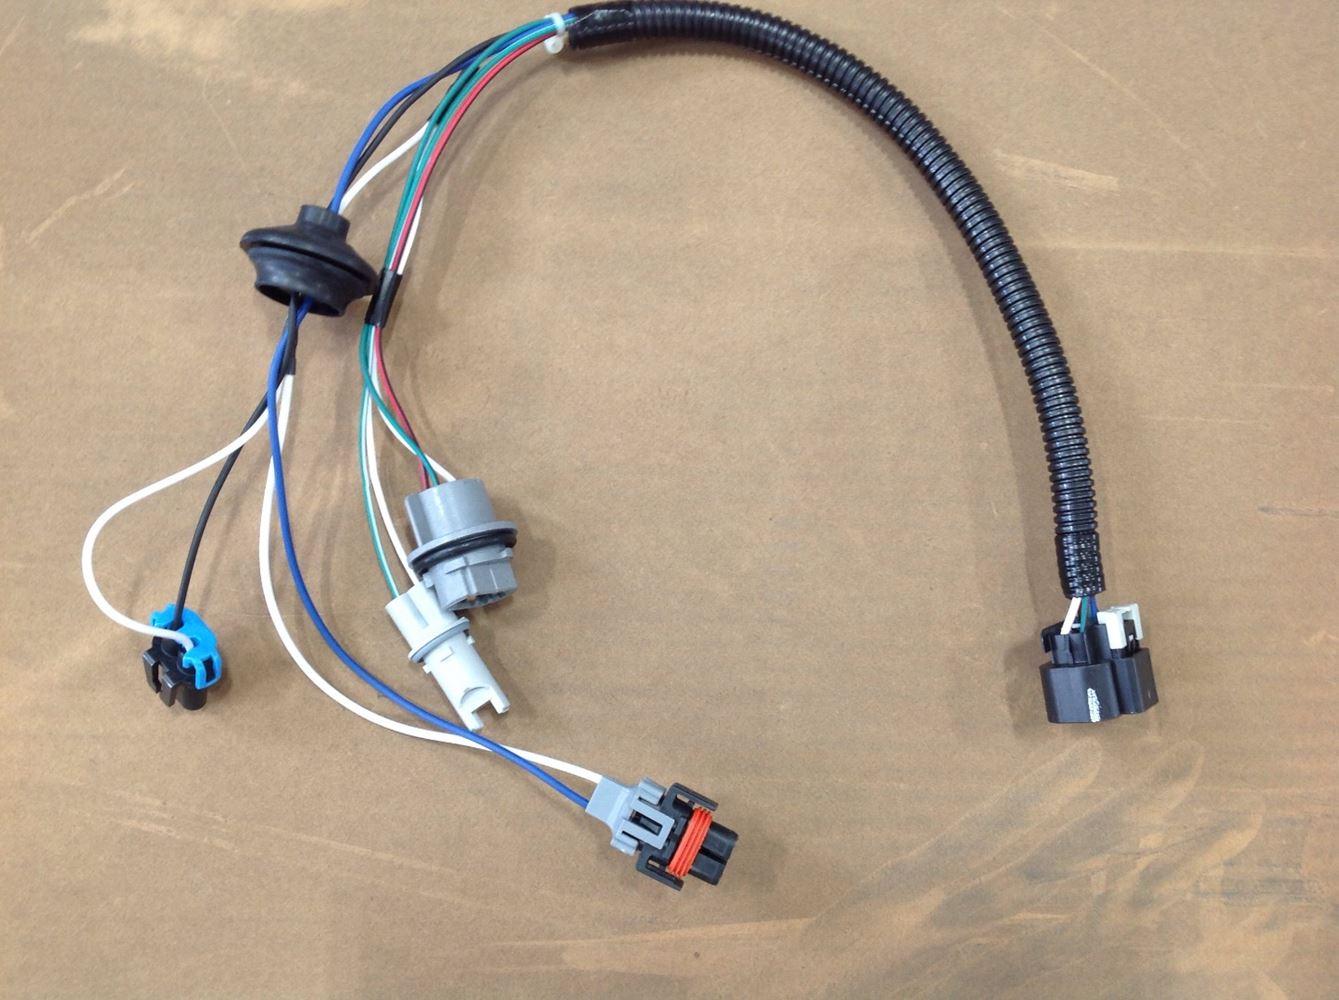 hight resolution of  volvo vnl stock tag857 headlamp ys tpi on gm headlight wiring 350z headlight wiring harness